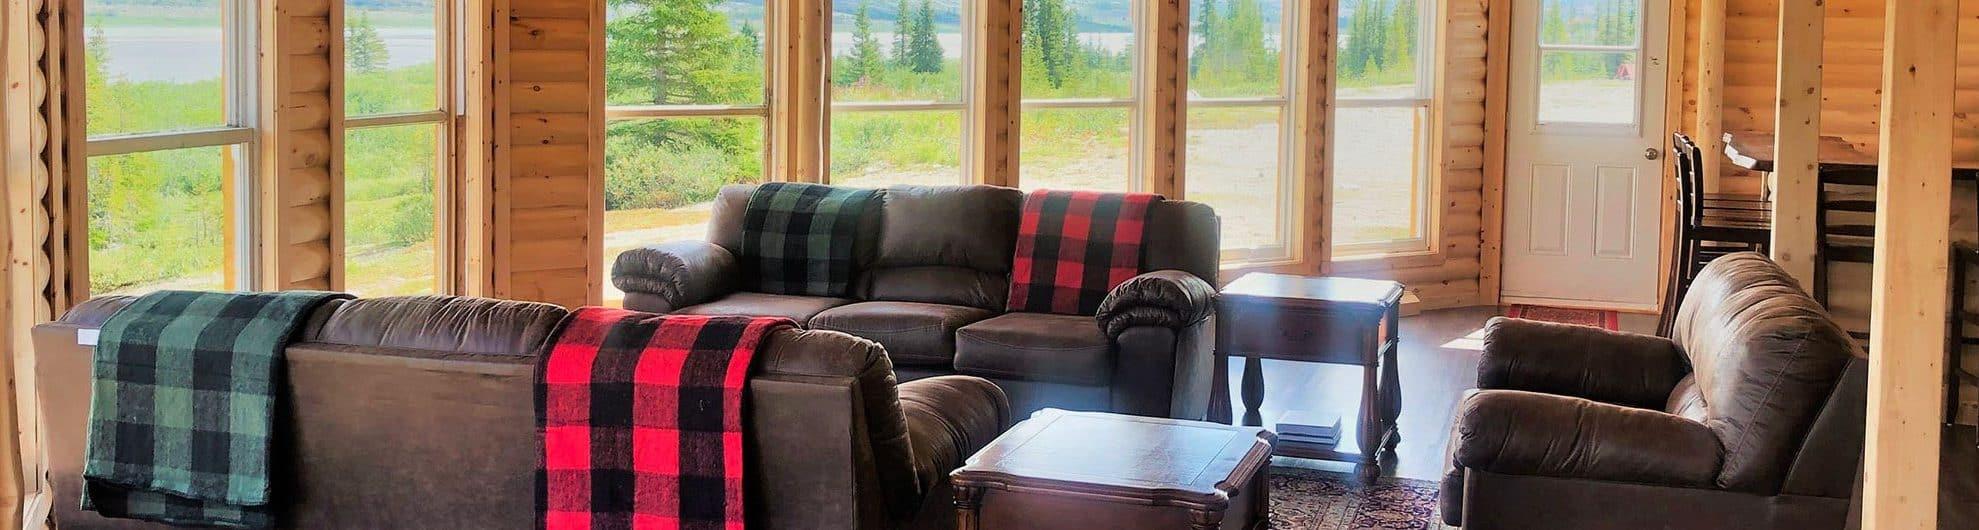 Wedge Hills Lodge Nunavik, Quebec, Canada